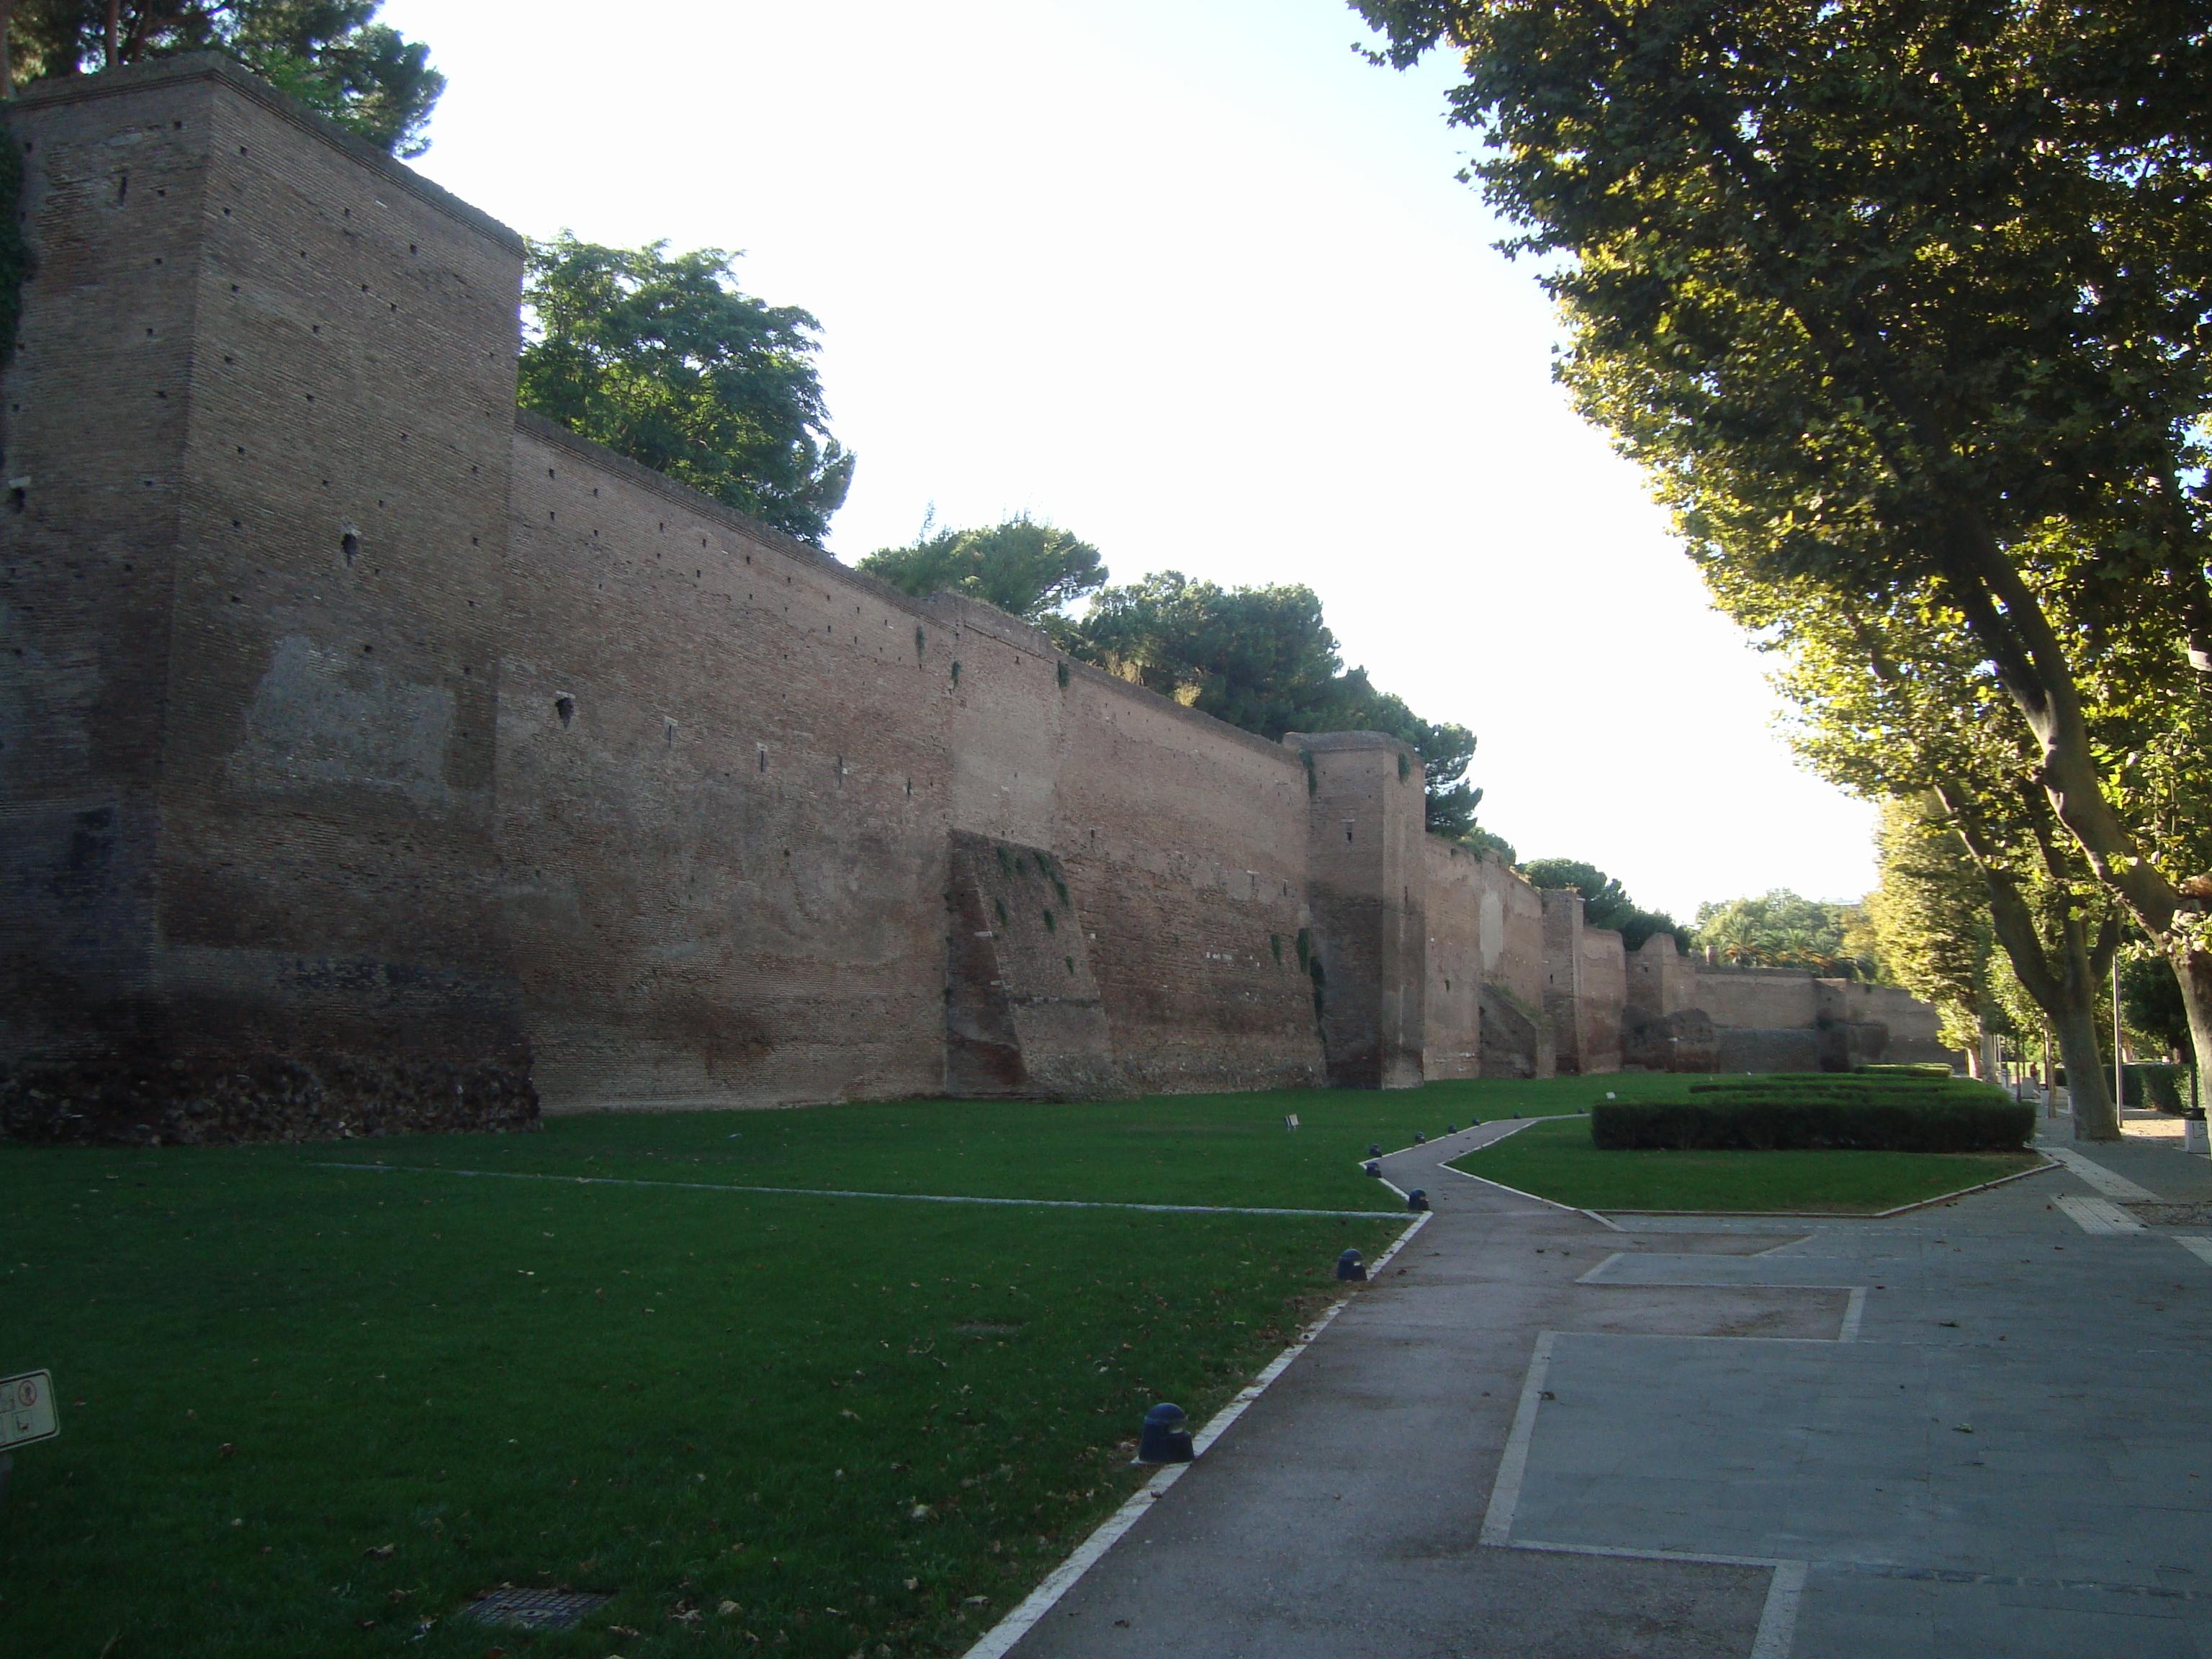 mura aureliane tra porta metronia e porta latina - Roma Mura Aureliane tra Porta Metronia e Porta Latina - Mura Aureliane tra Porta Metronia e Porta Latina